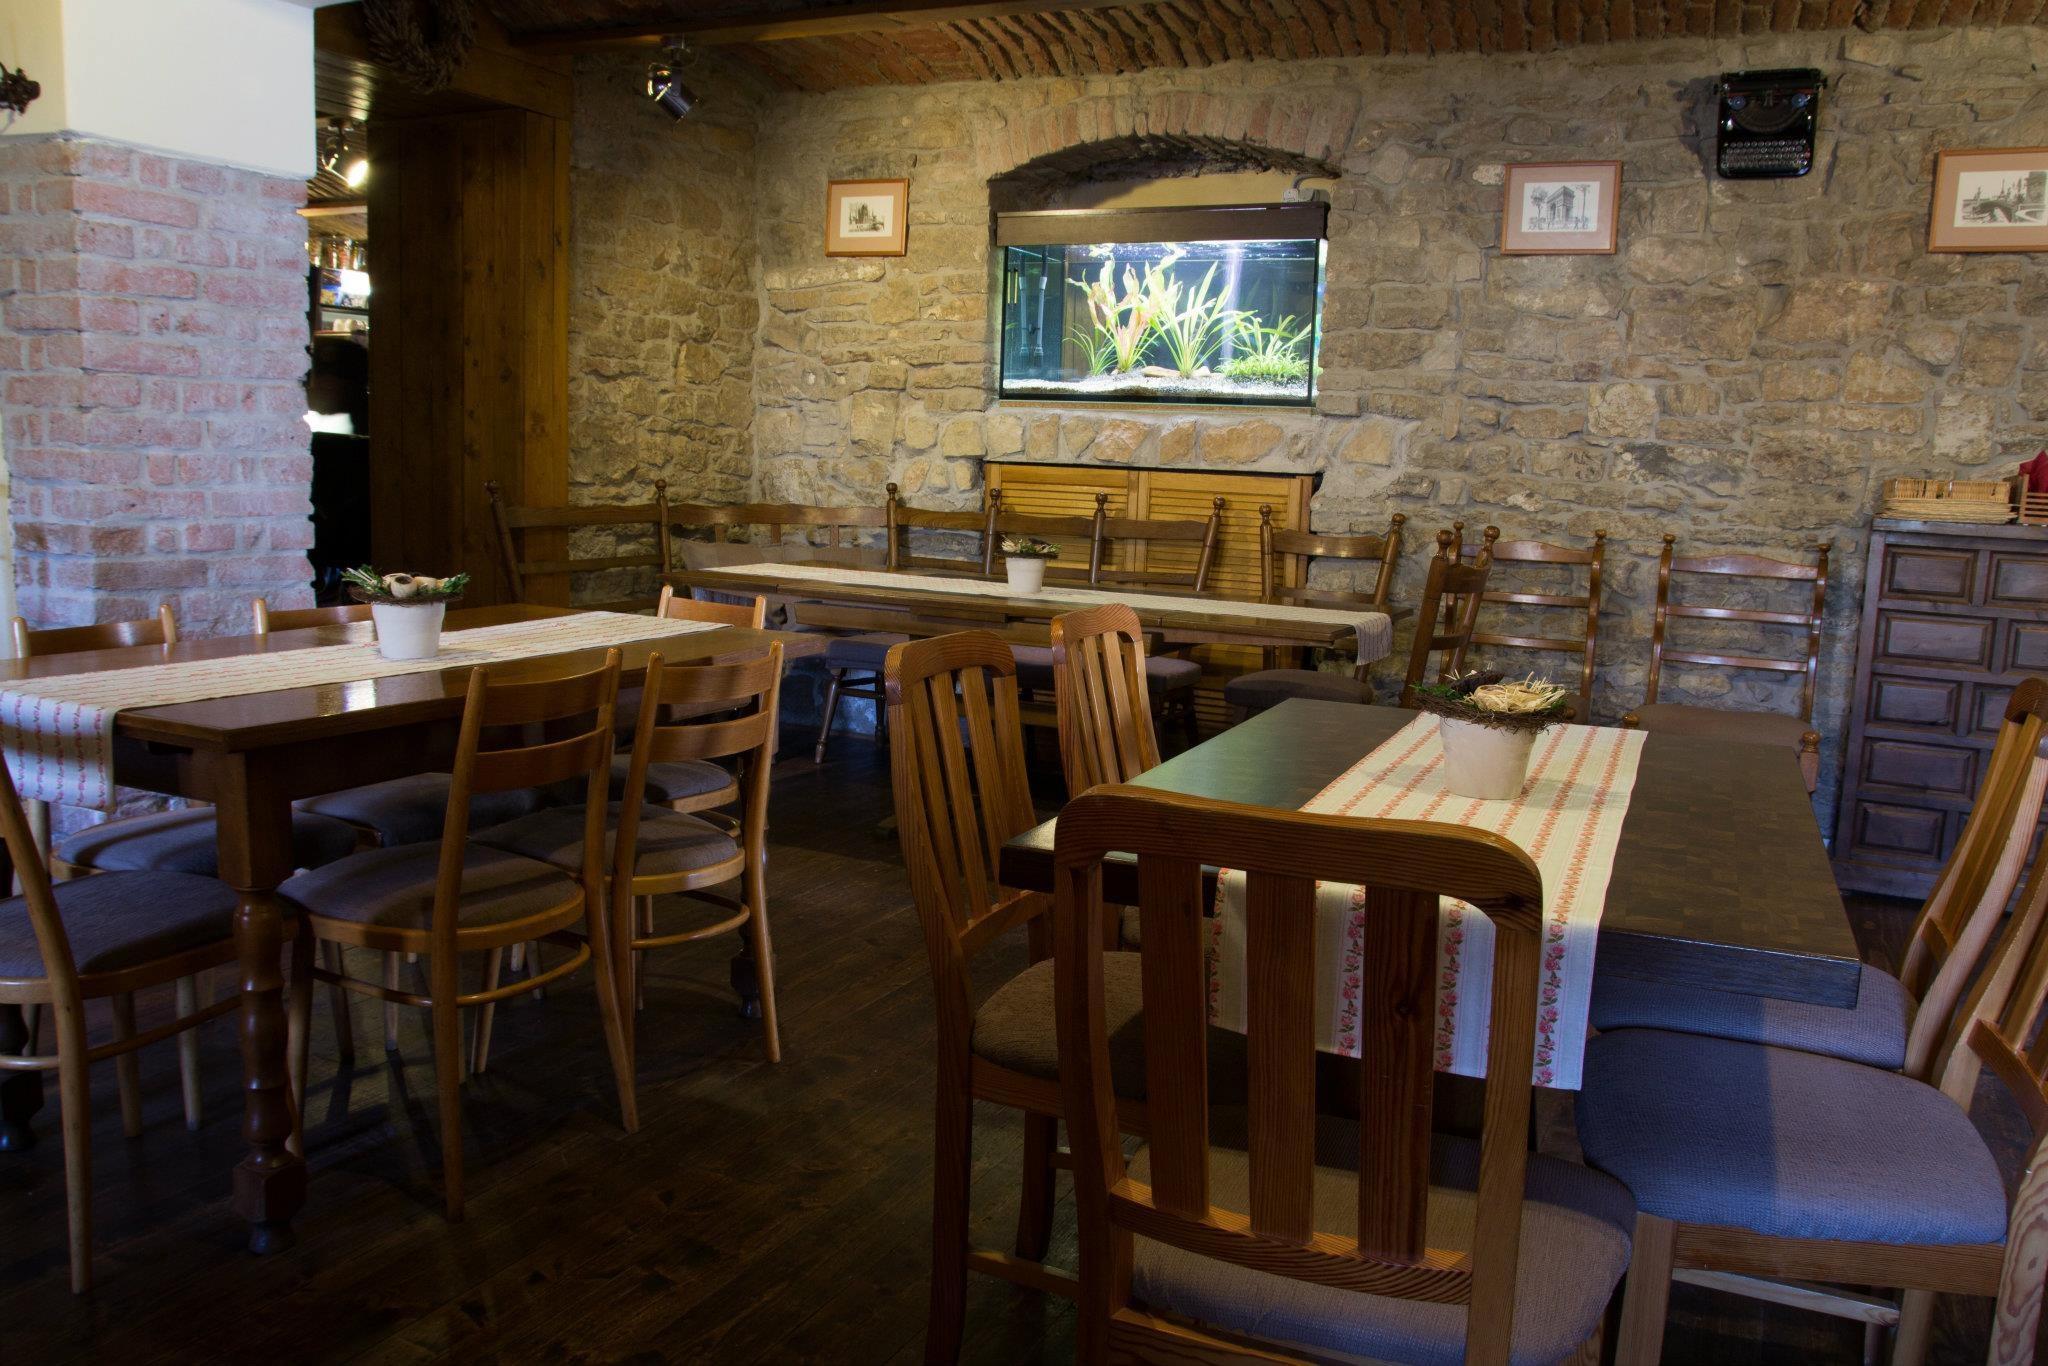 divadélko - restaurant